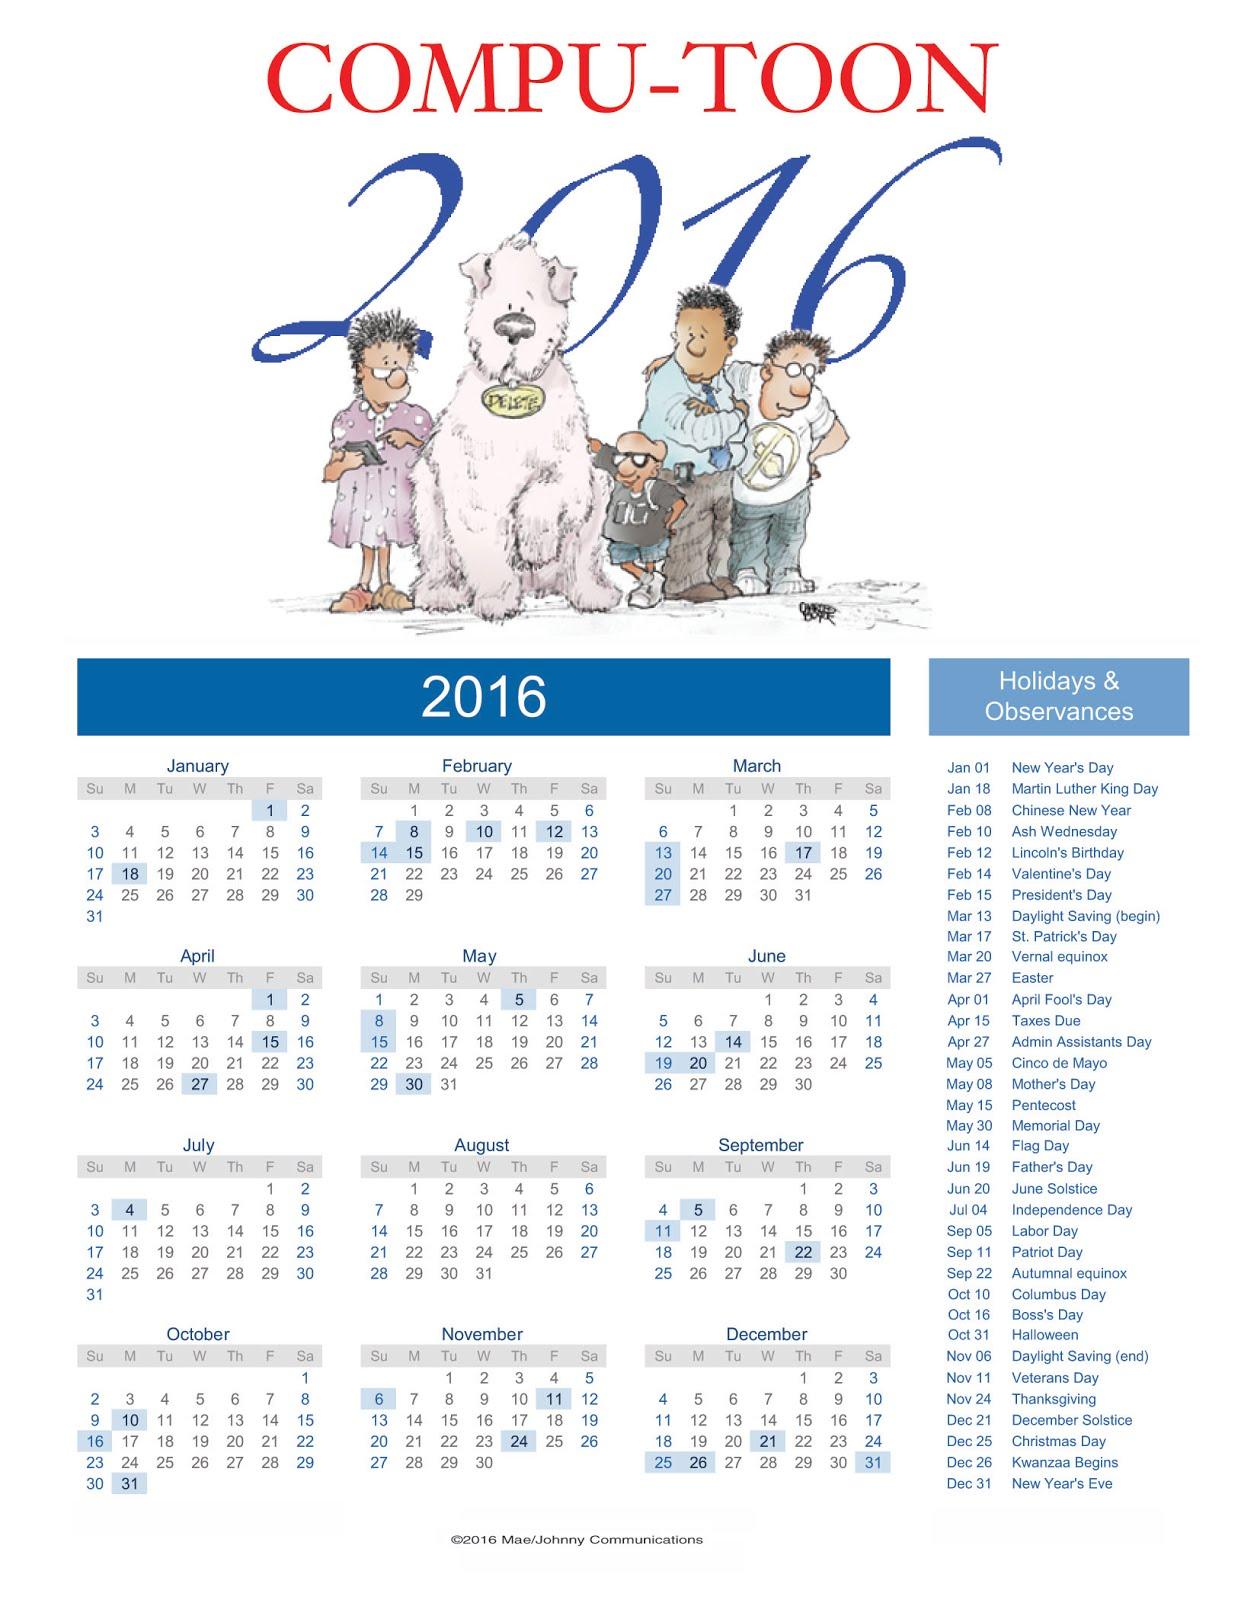 Compu-toon 2016 Calendar